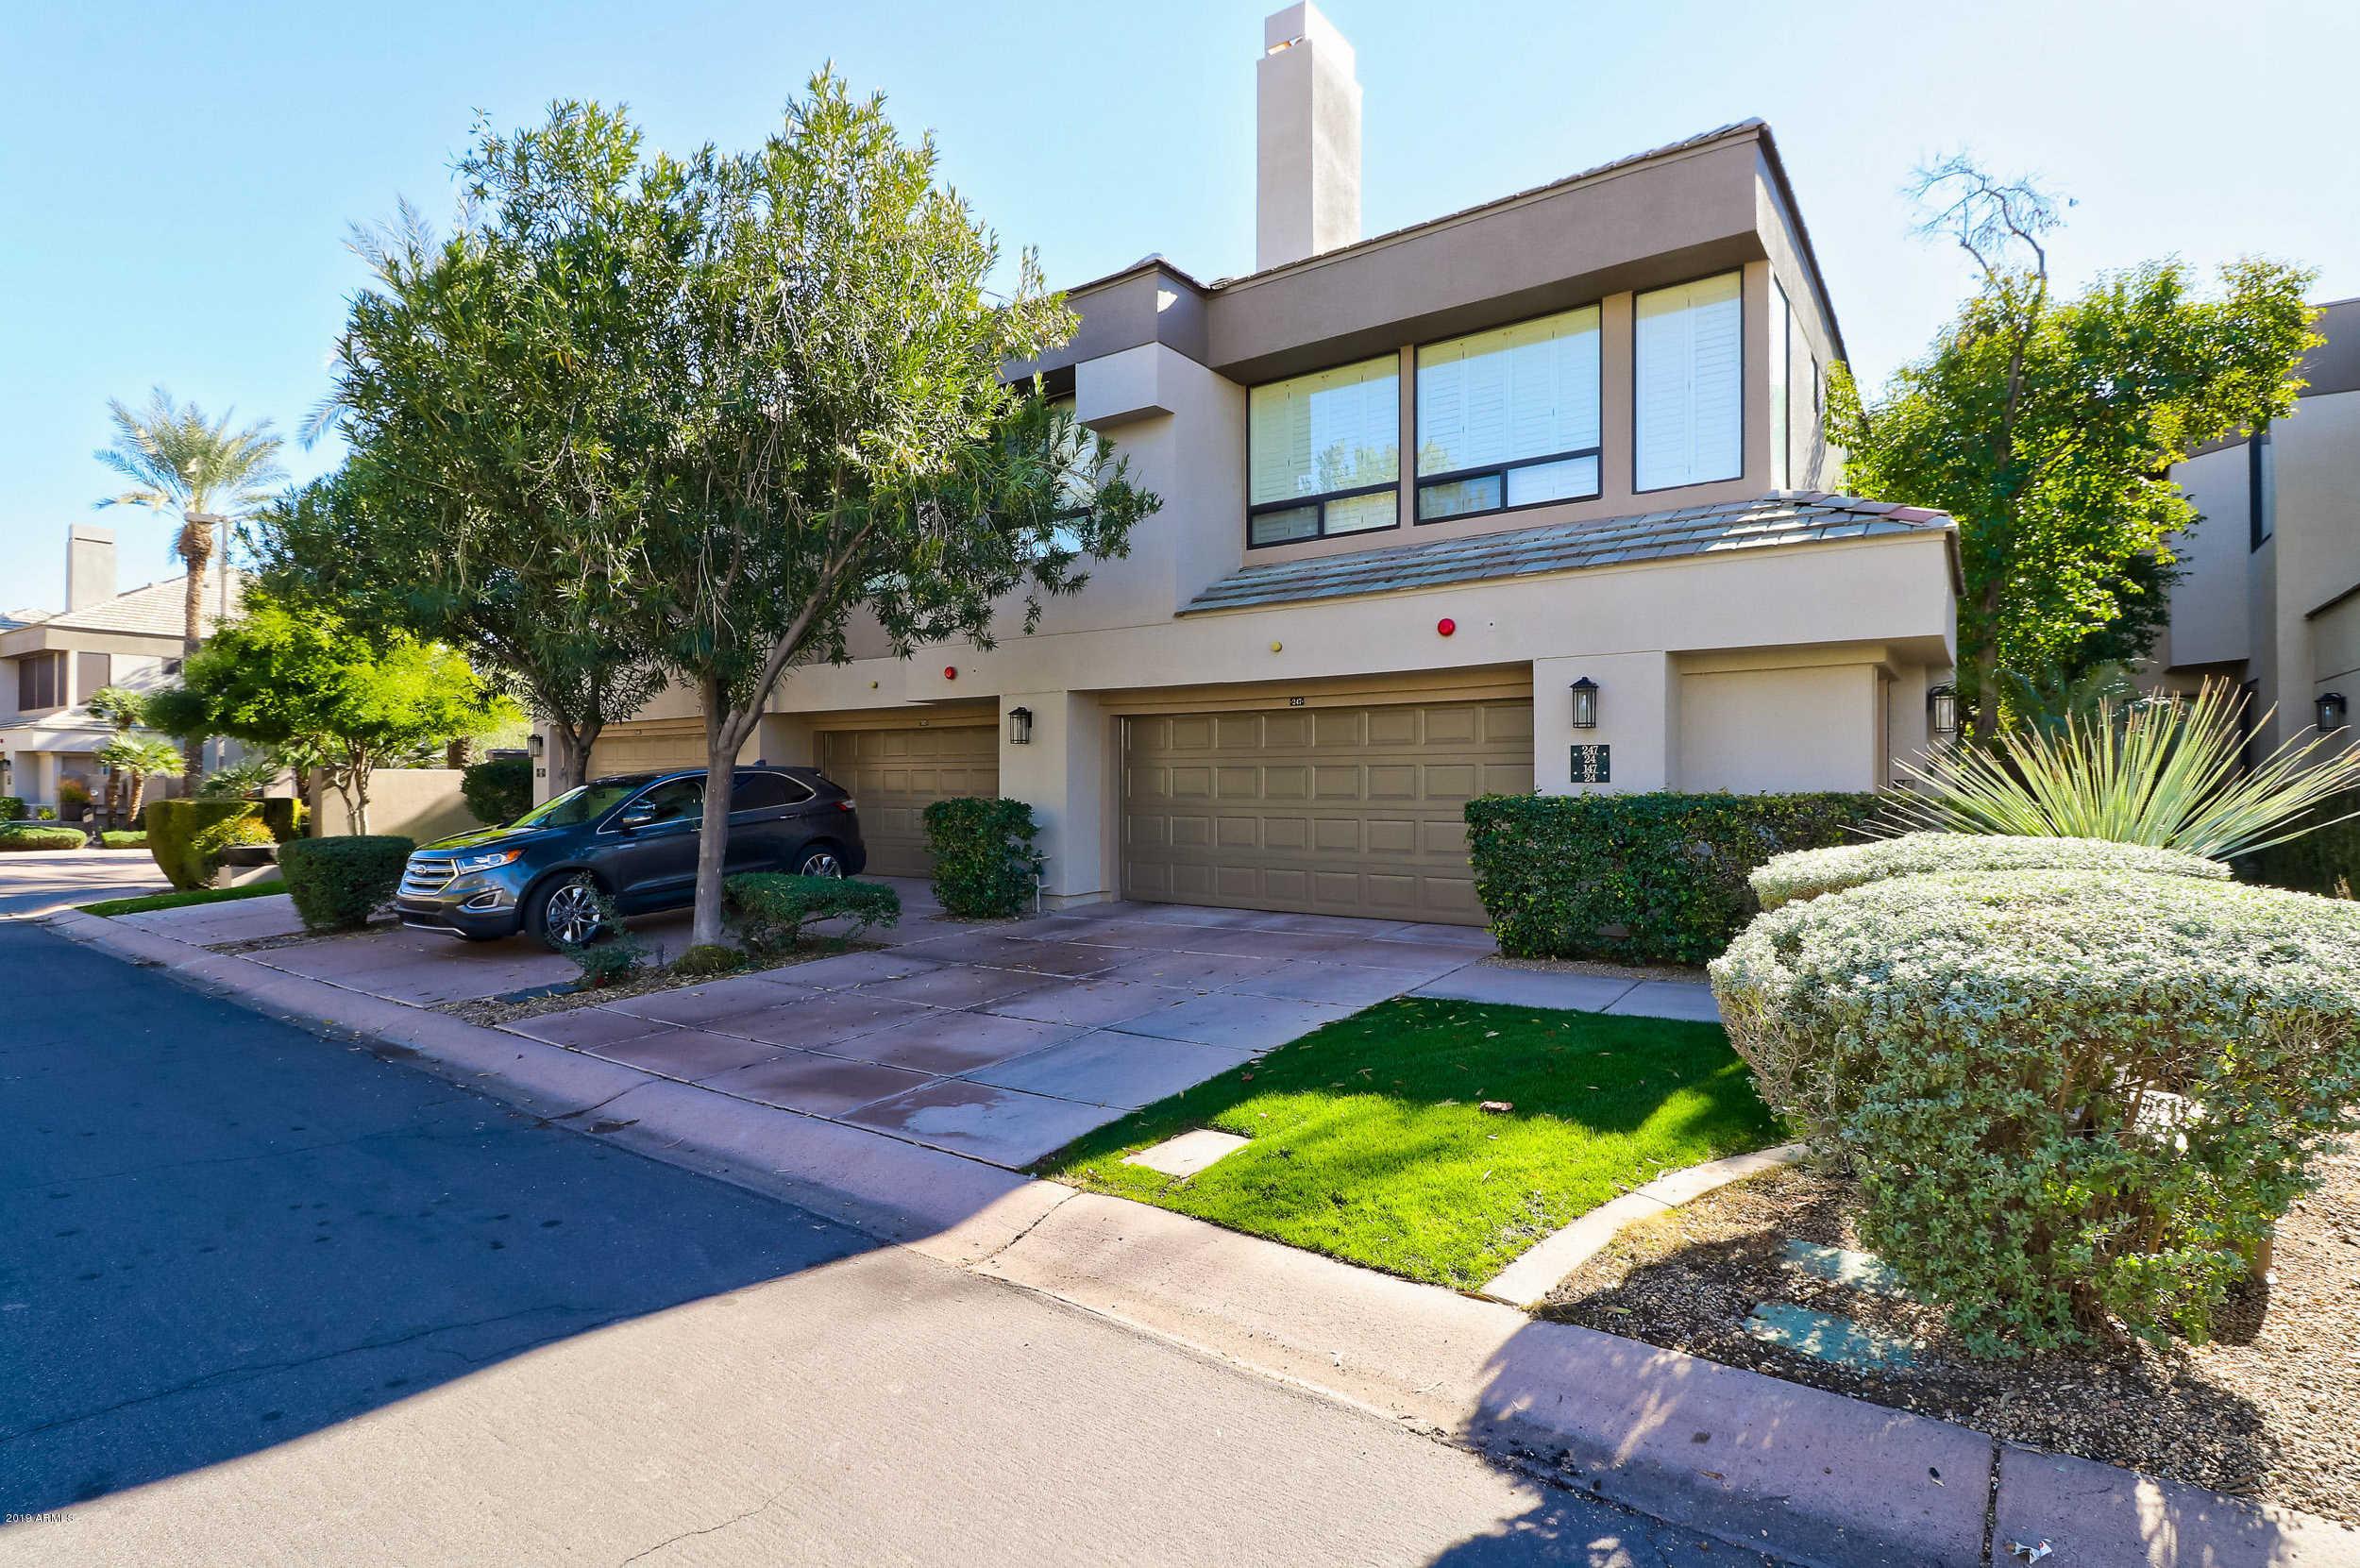 $525,000 - 2Br/2Ba -  for Sale in 7400 Gainey Club Drive Condo, Scottsdale